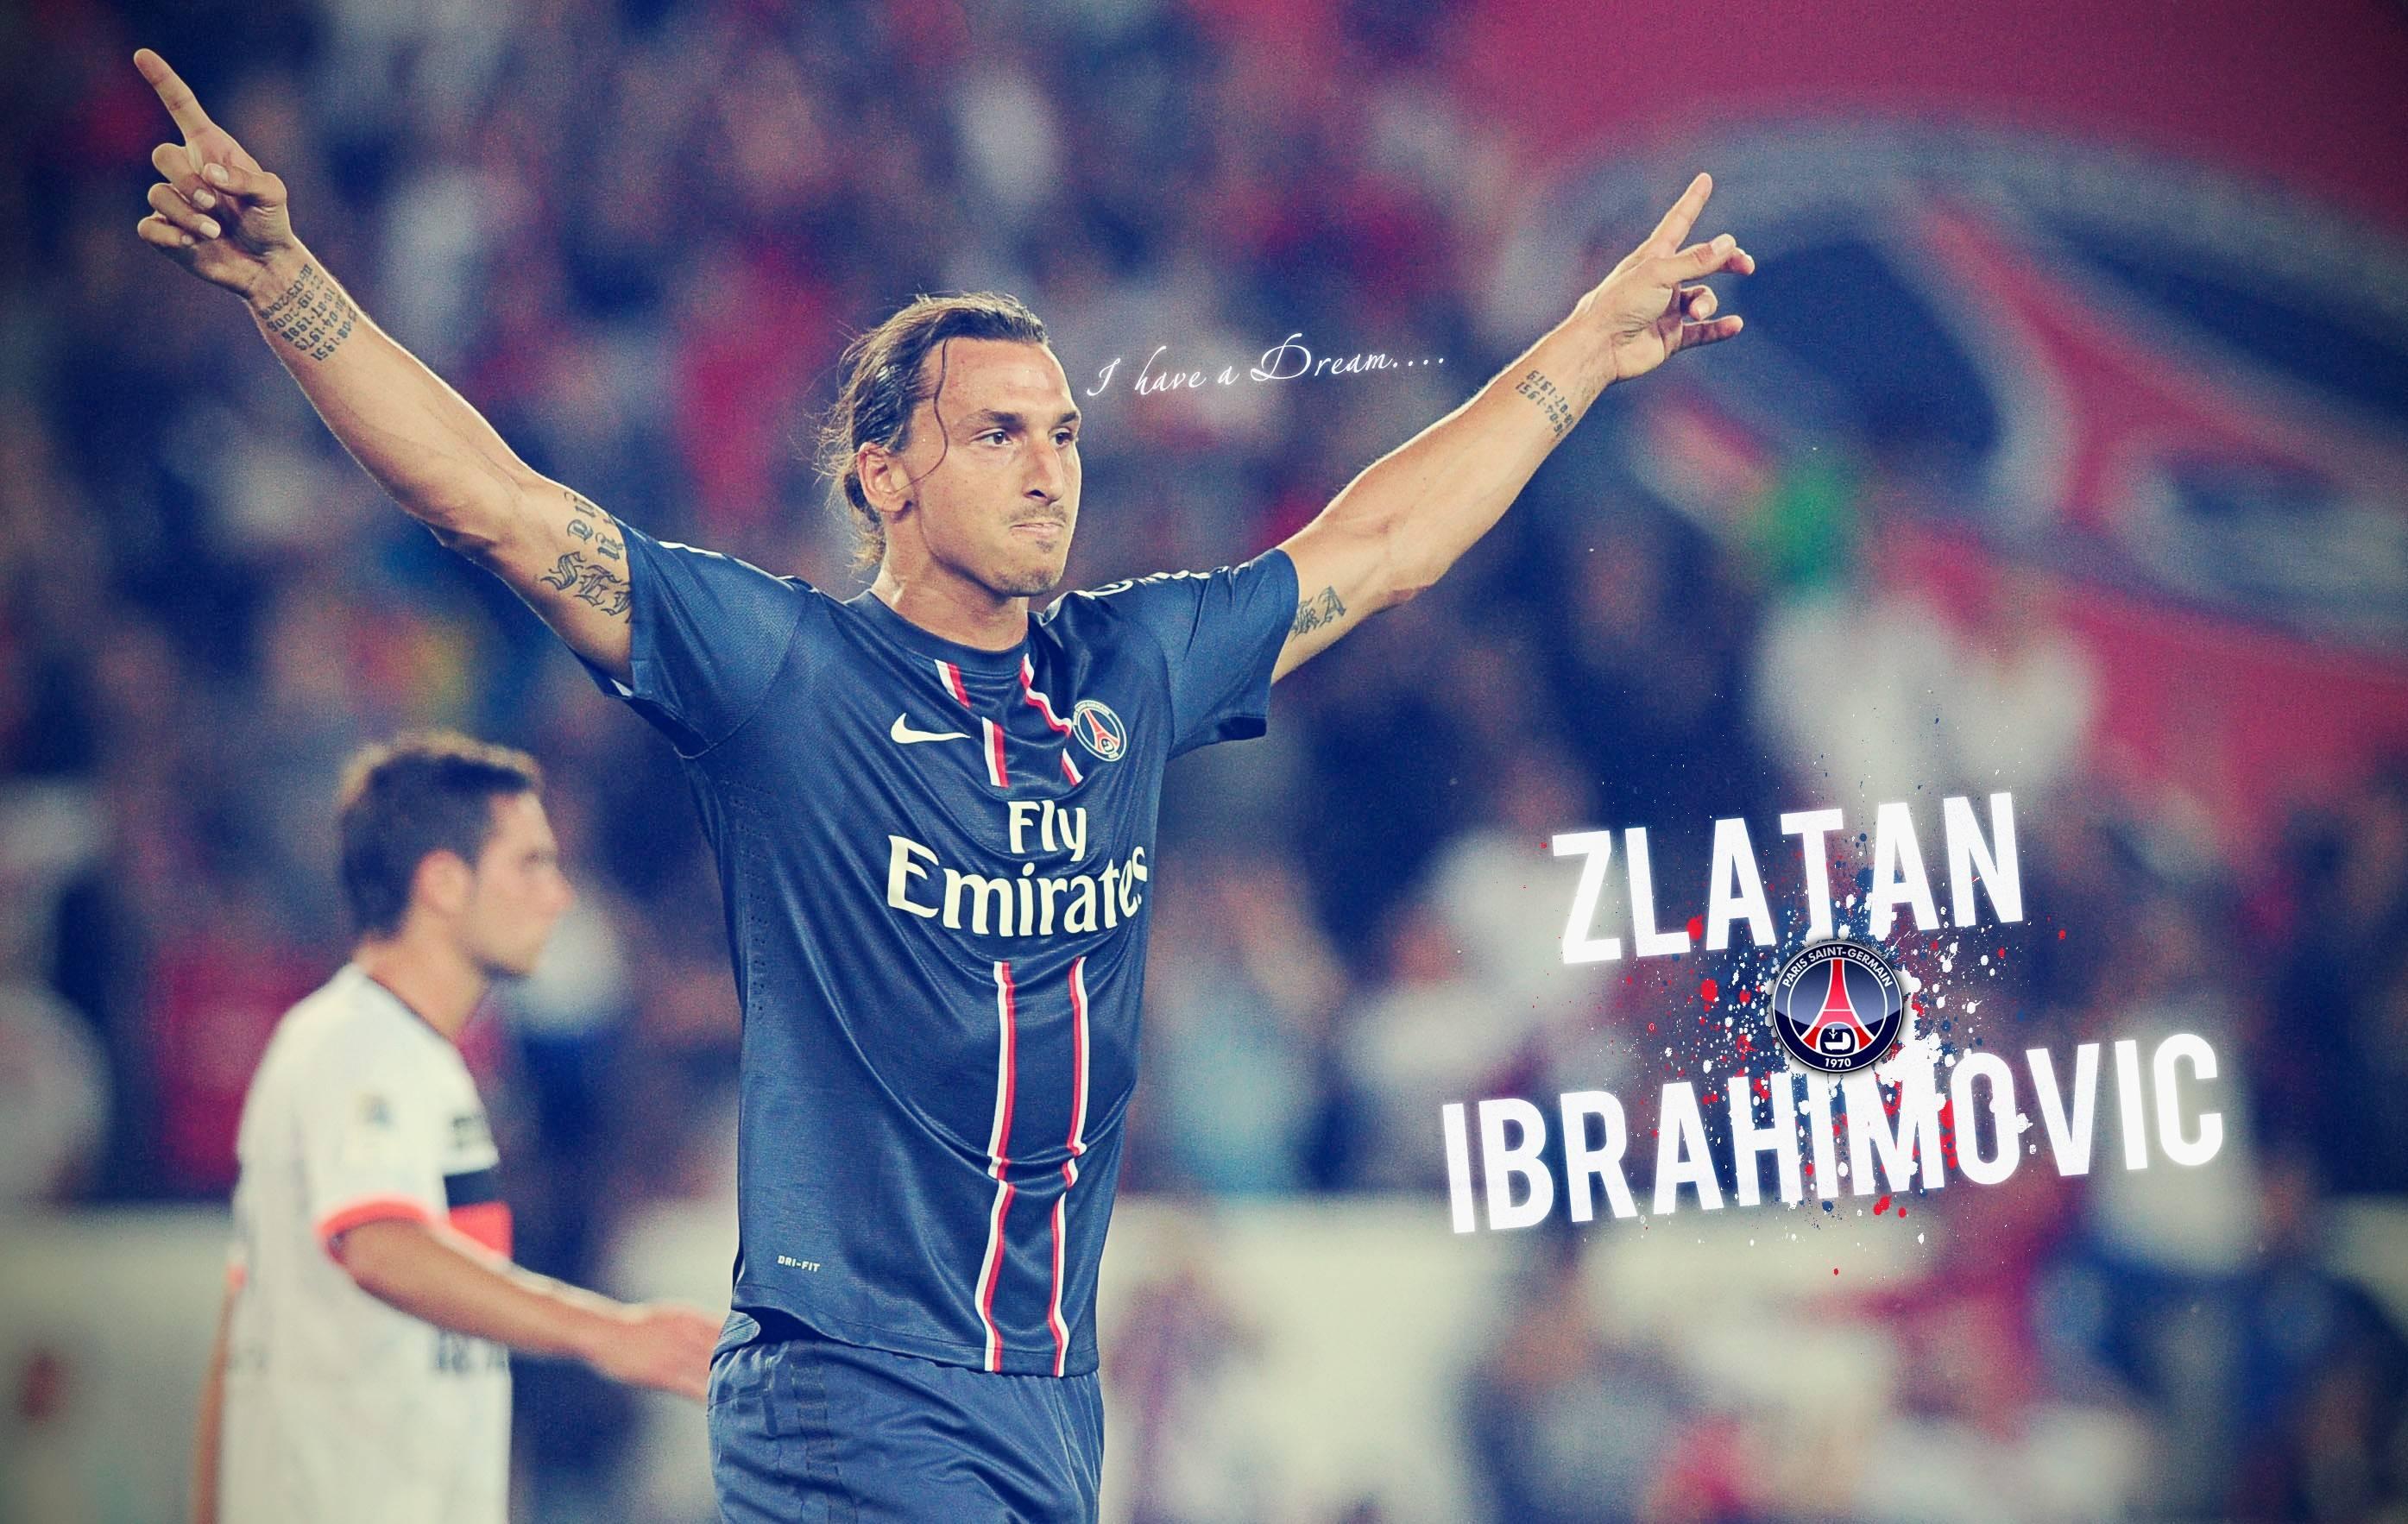 Zlatan Ibrahimovic Wallpapers Top Free Zlatan Ibrahimovic Backgrounds Wallpaperaccess